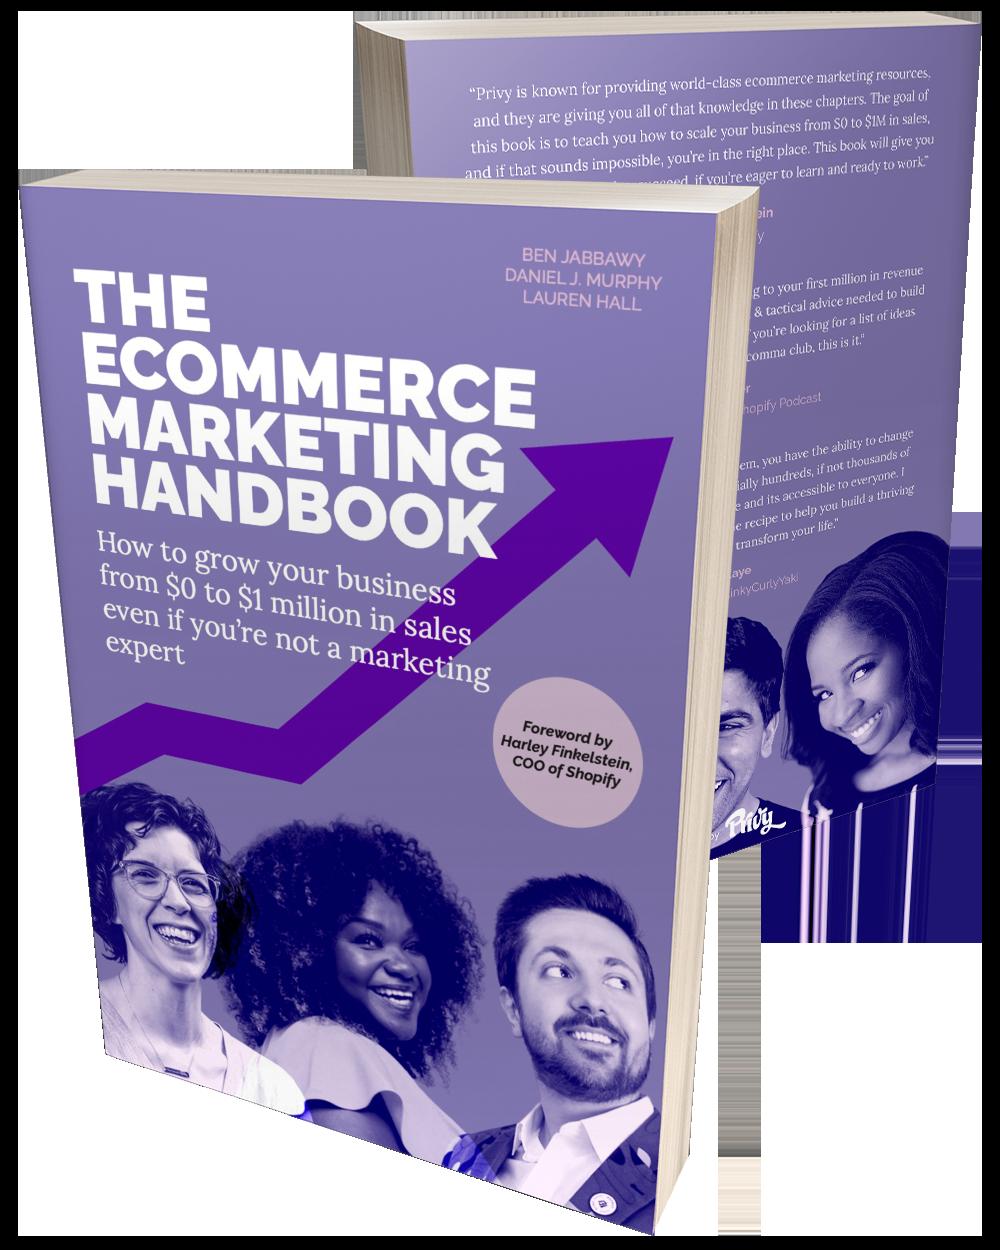 the_ecommerce_marketing_handbook